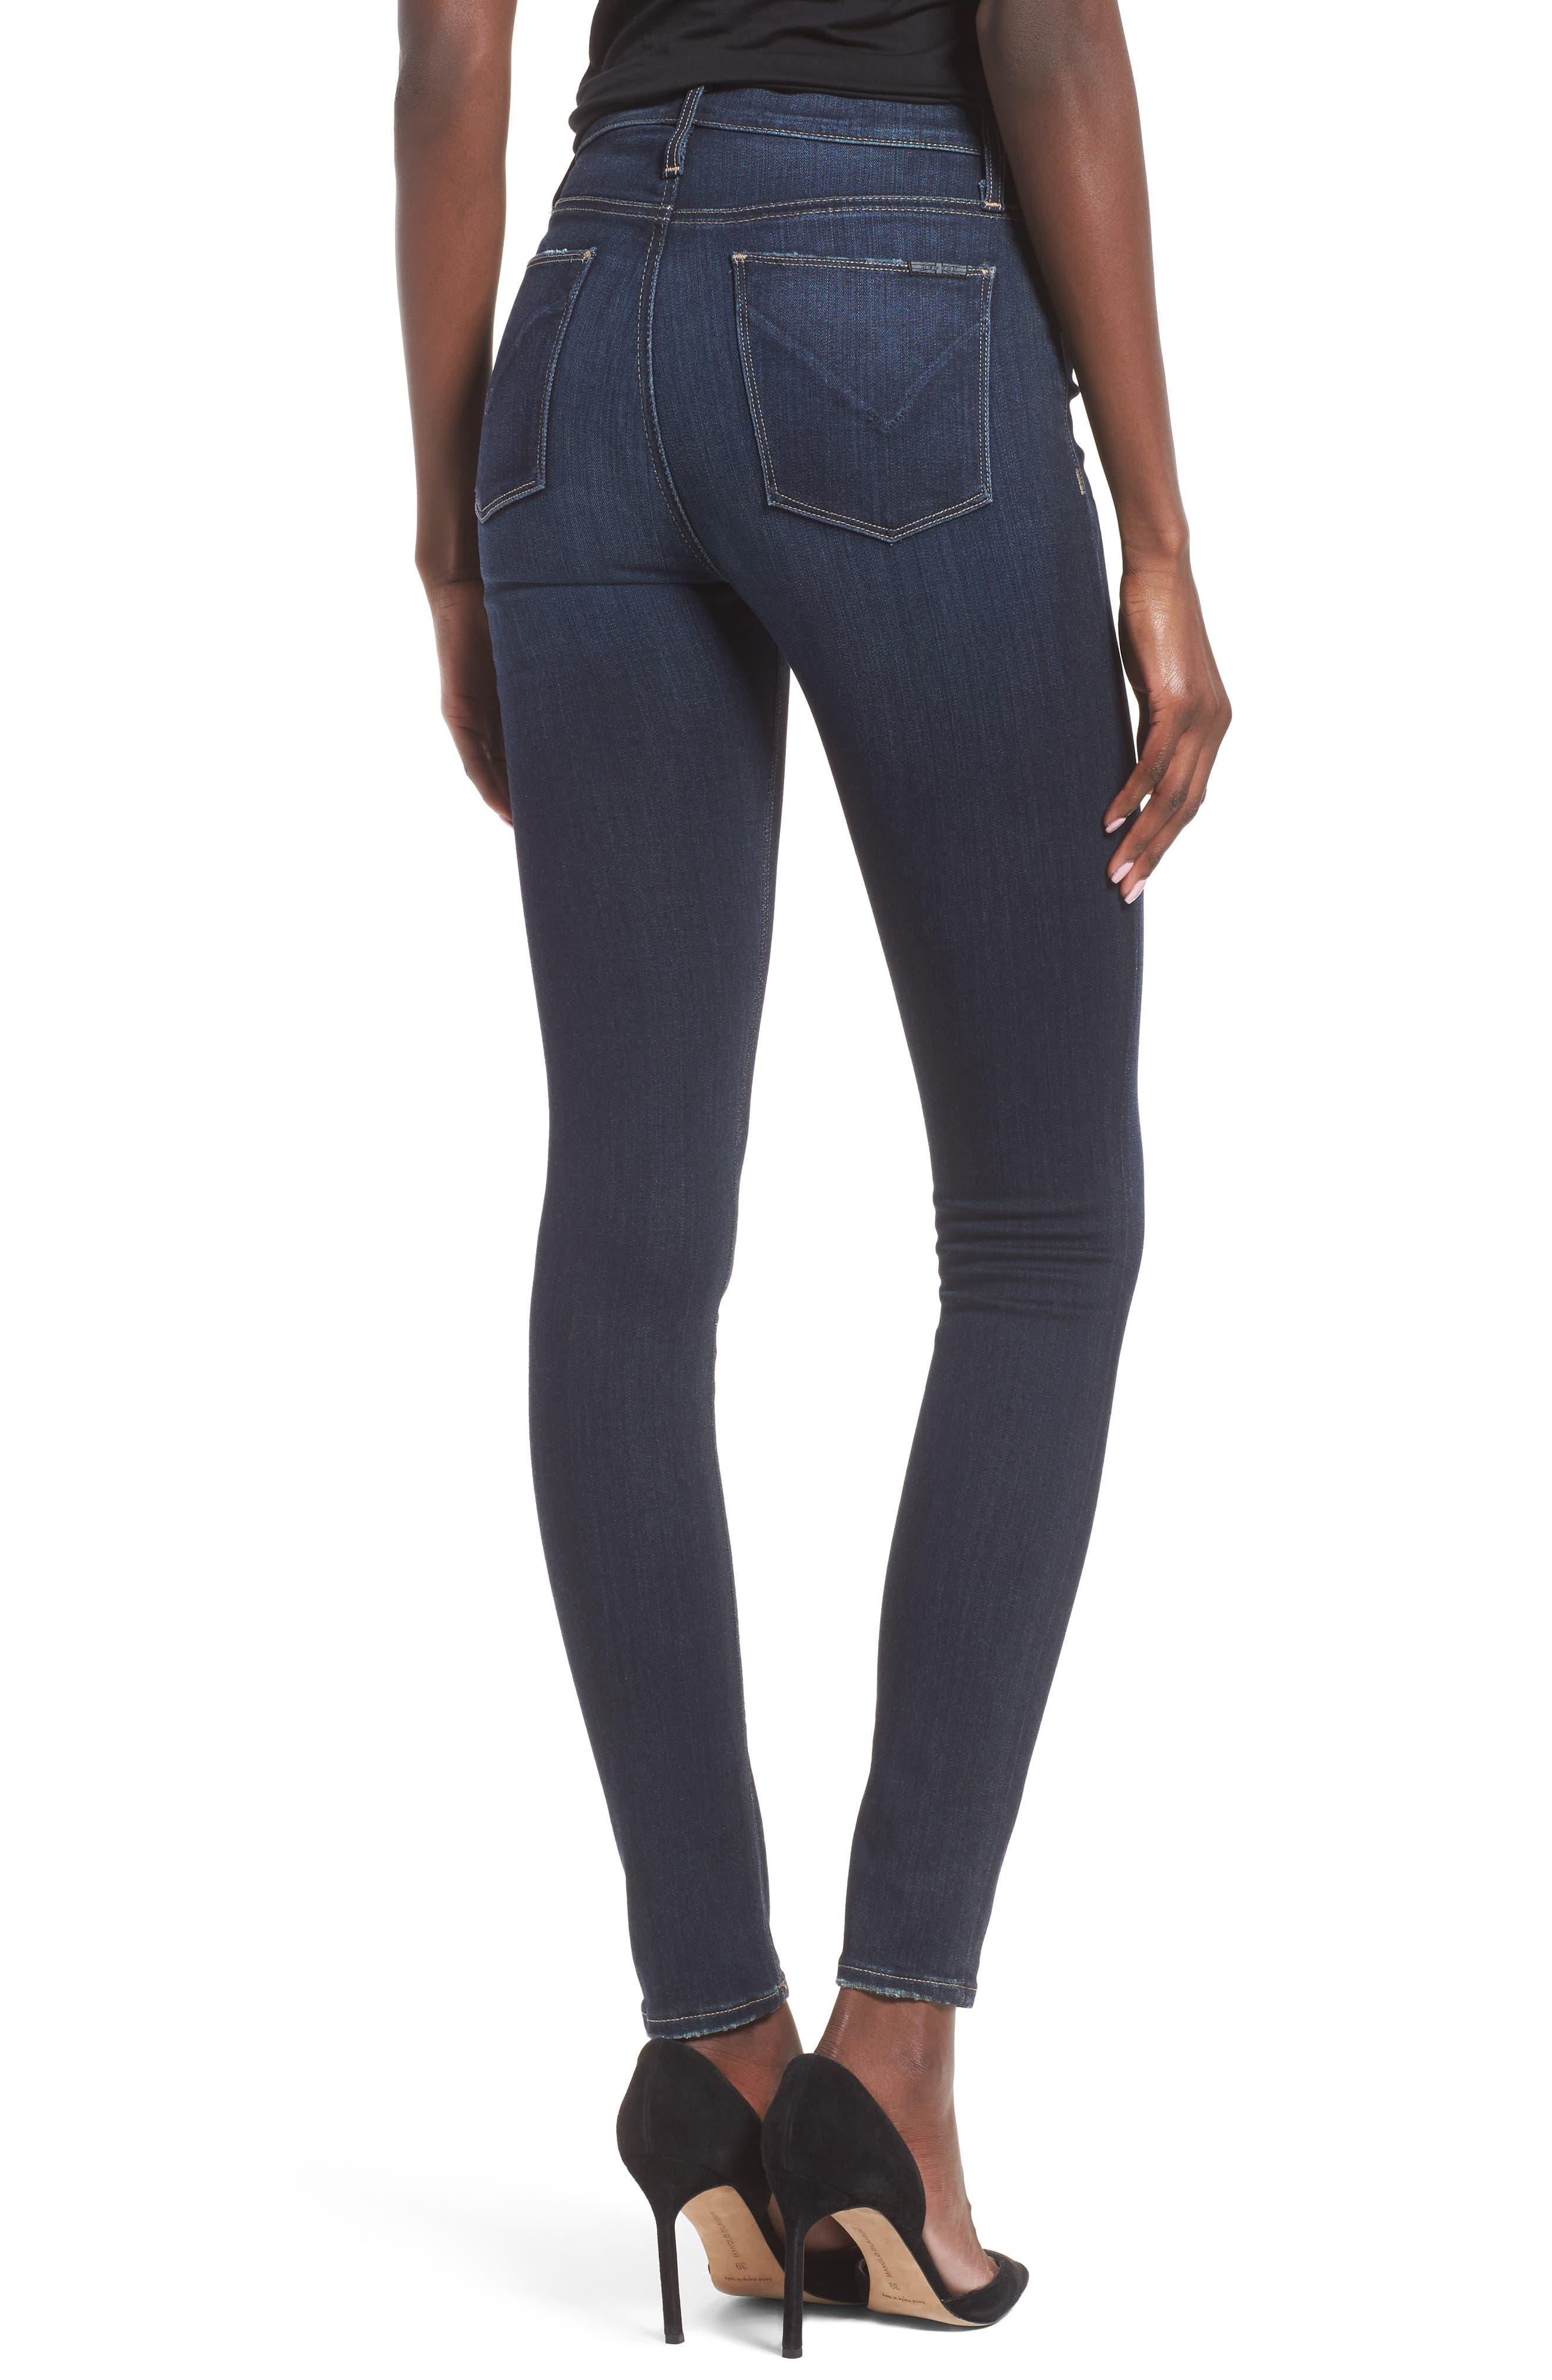 Barbara High Waist Super Skinny Jeans,                             Alternate thumbnail 4, color,